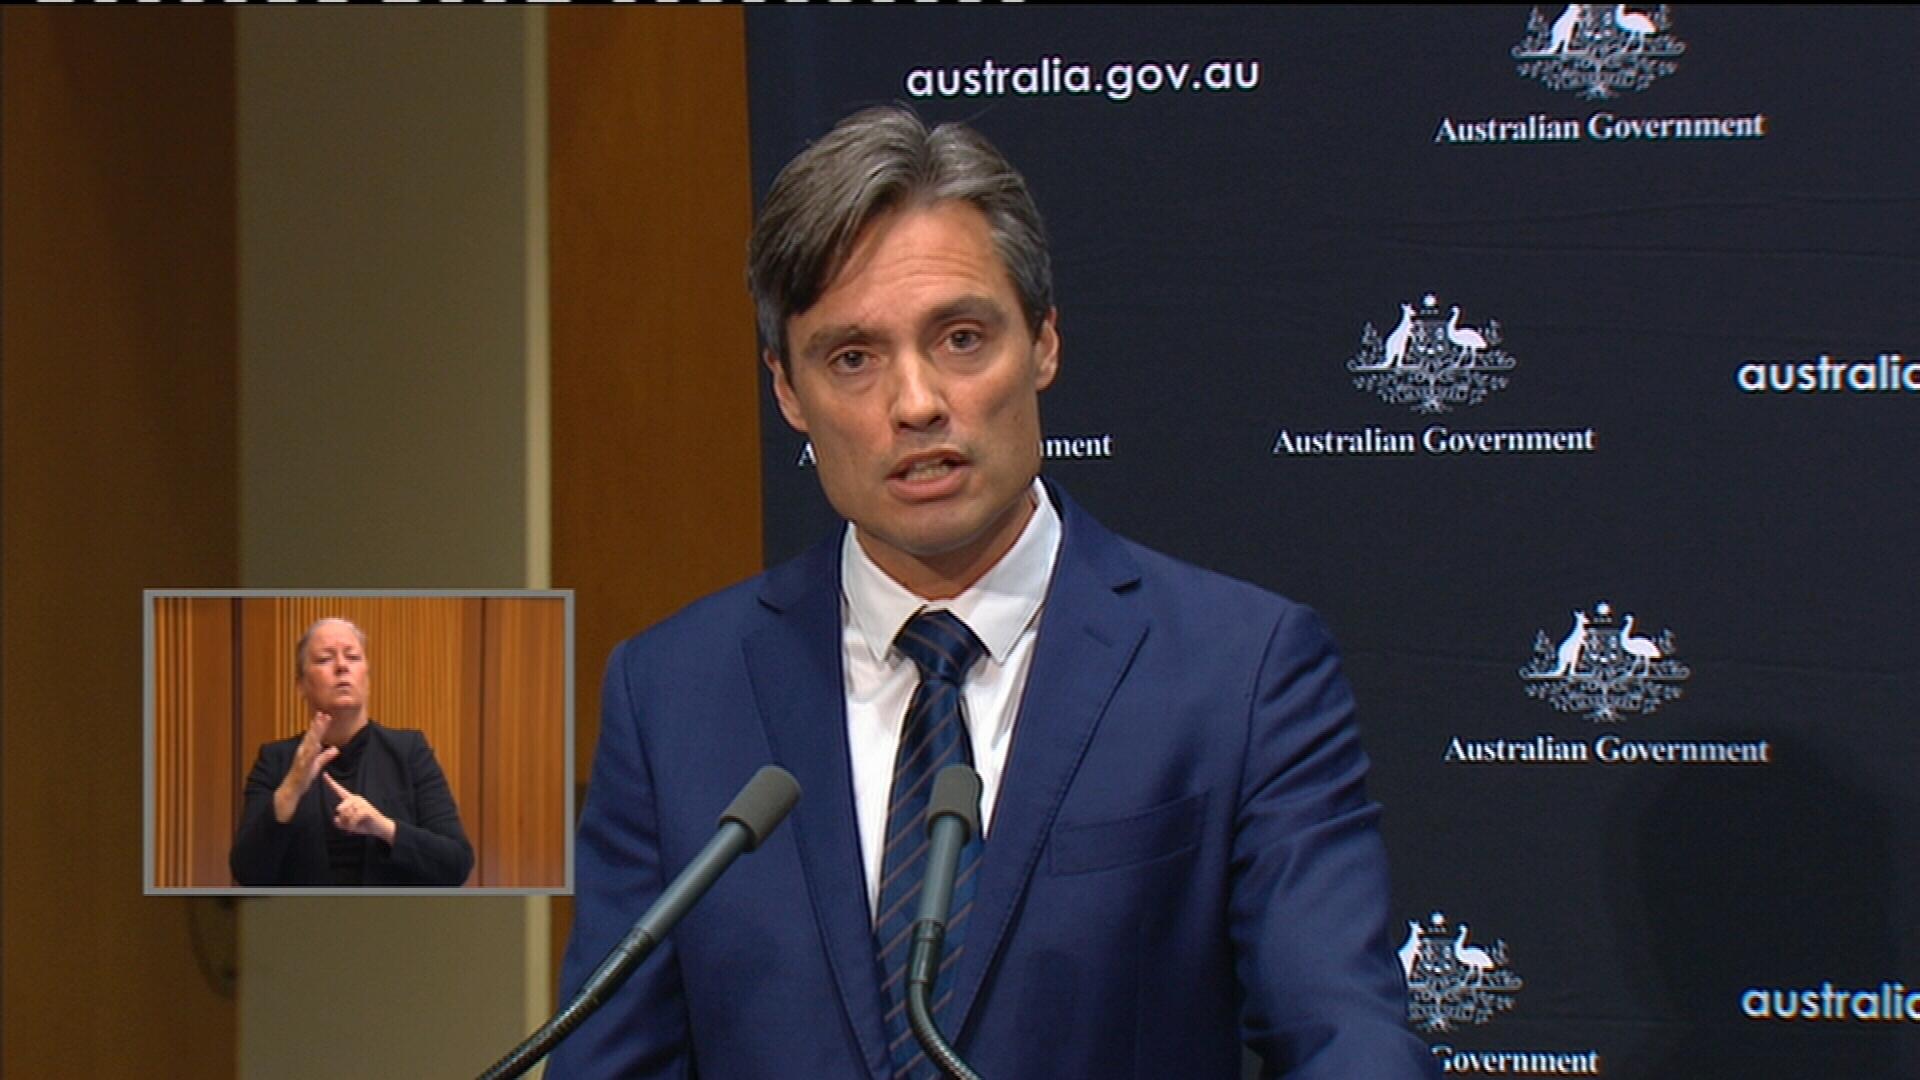 Coronavirus: Australia has 'more than sufficient' ventilators